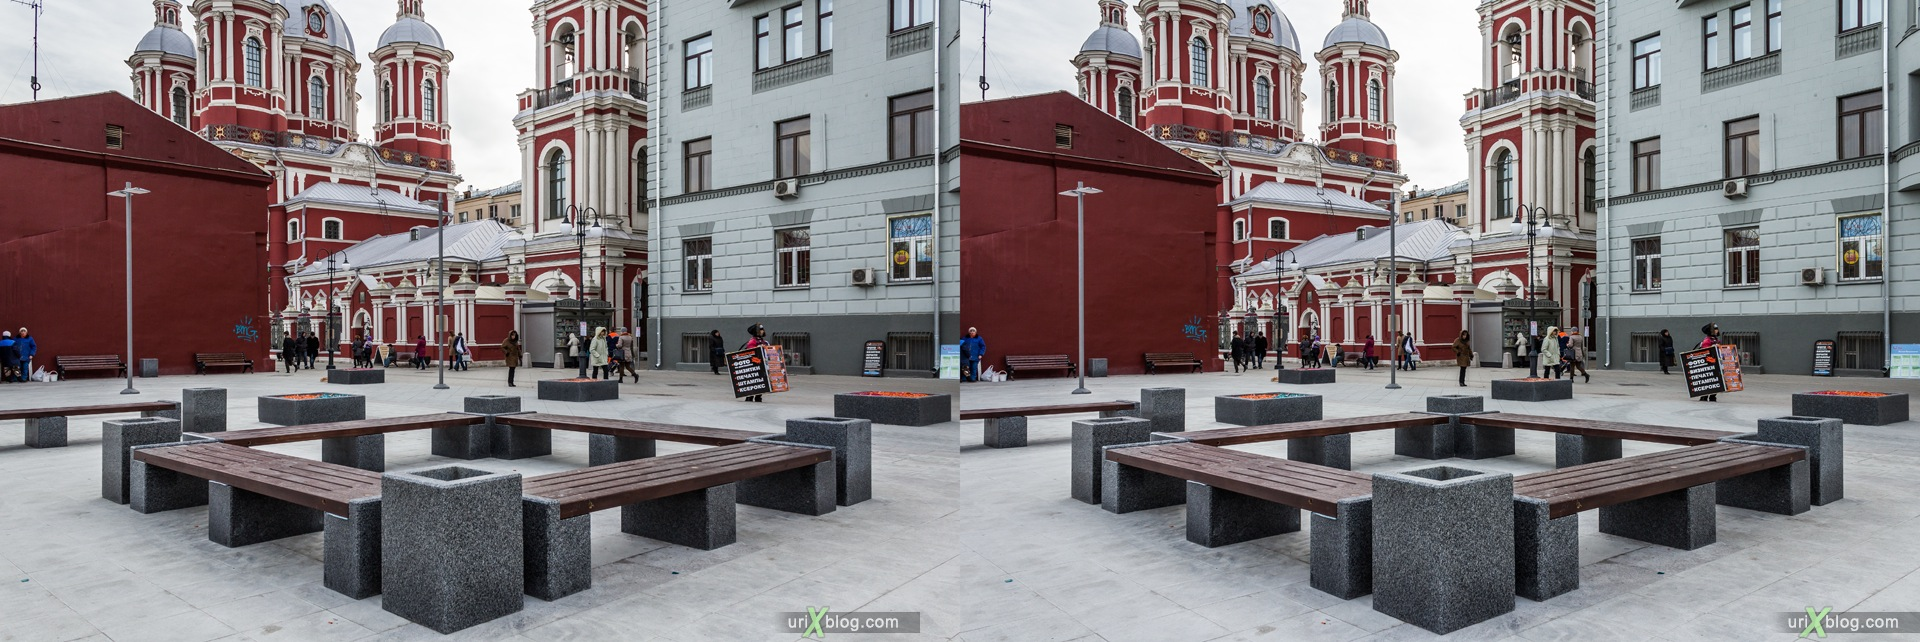 2013, Moscow, Russia, Tratjakovskaya, metro, square, church, street, new pedestrian zone, 3D, stereo pair, cross-eyed, crossview, cross view stereo pair, stereoscopic